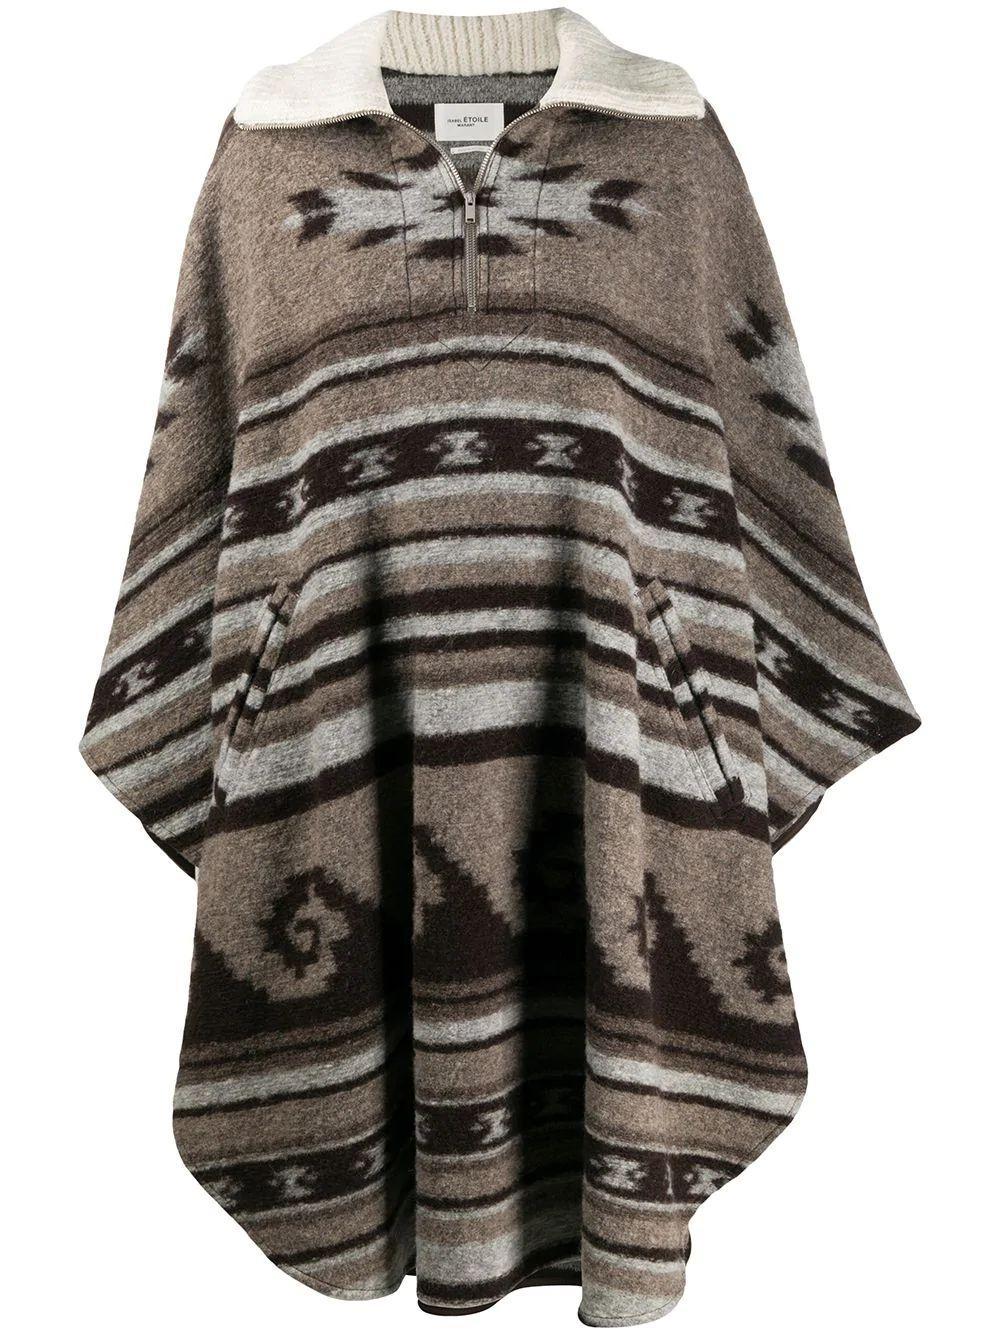 Gabin Navajo Blanket Coat Item # KP0035-20A064E